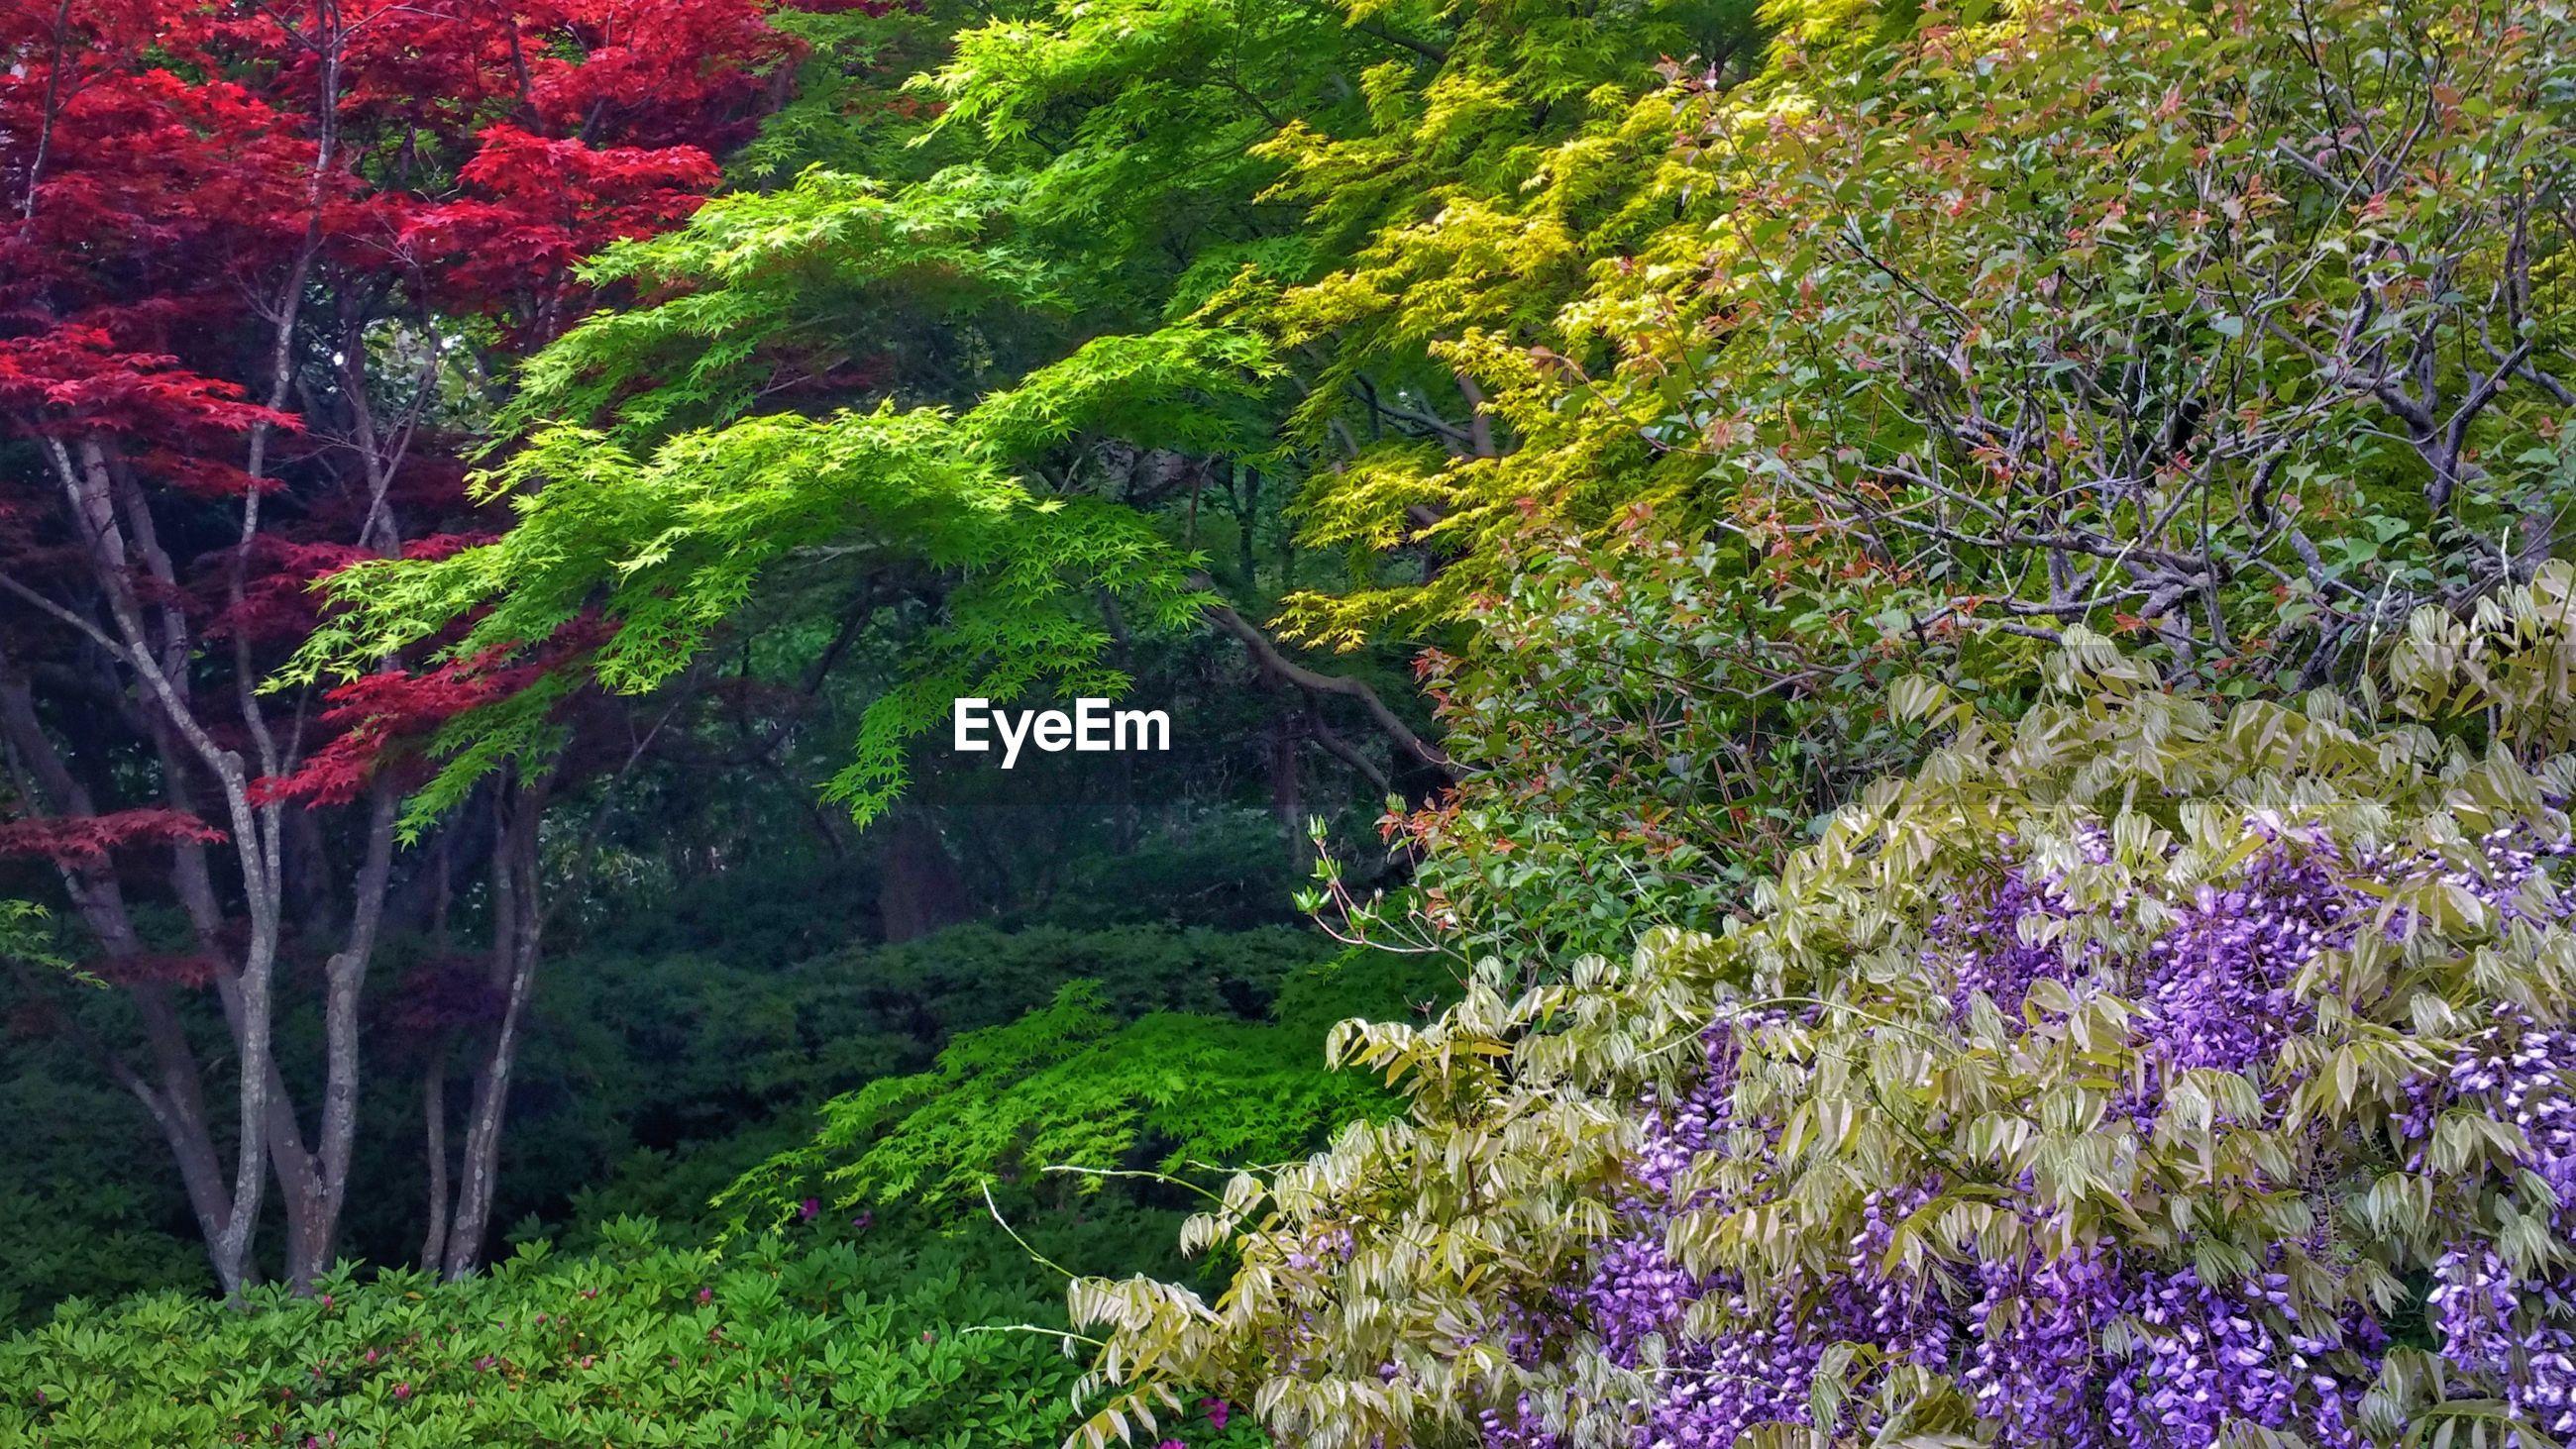 PURPLE FLOWERING PLANTS ON LAND